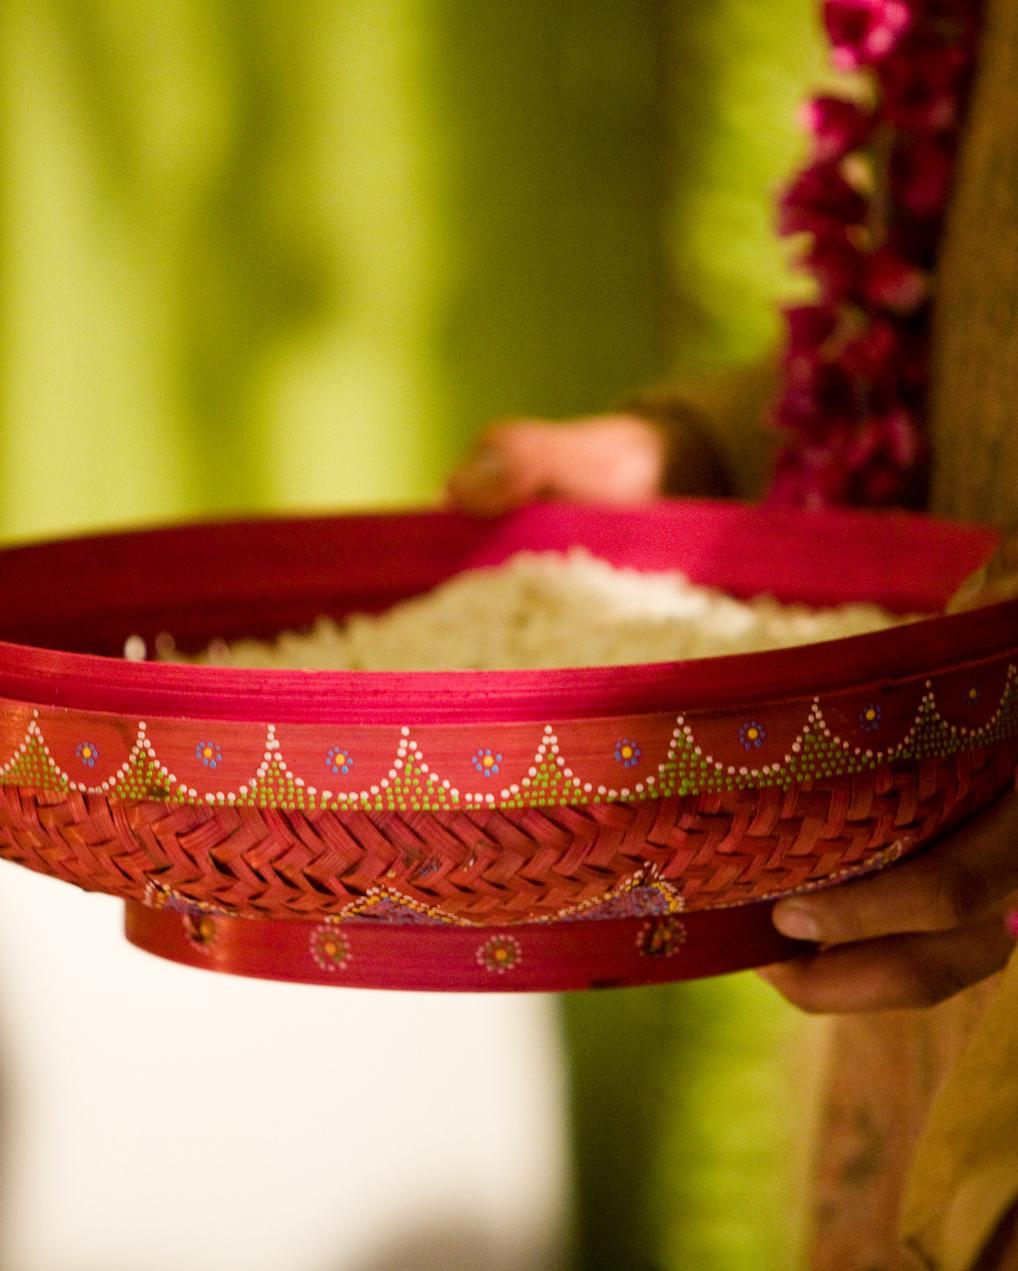 hindu-wedding-traditions-pot-of-rice-toronto-somina-gaurav-travel09-0615.jpg